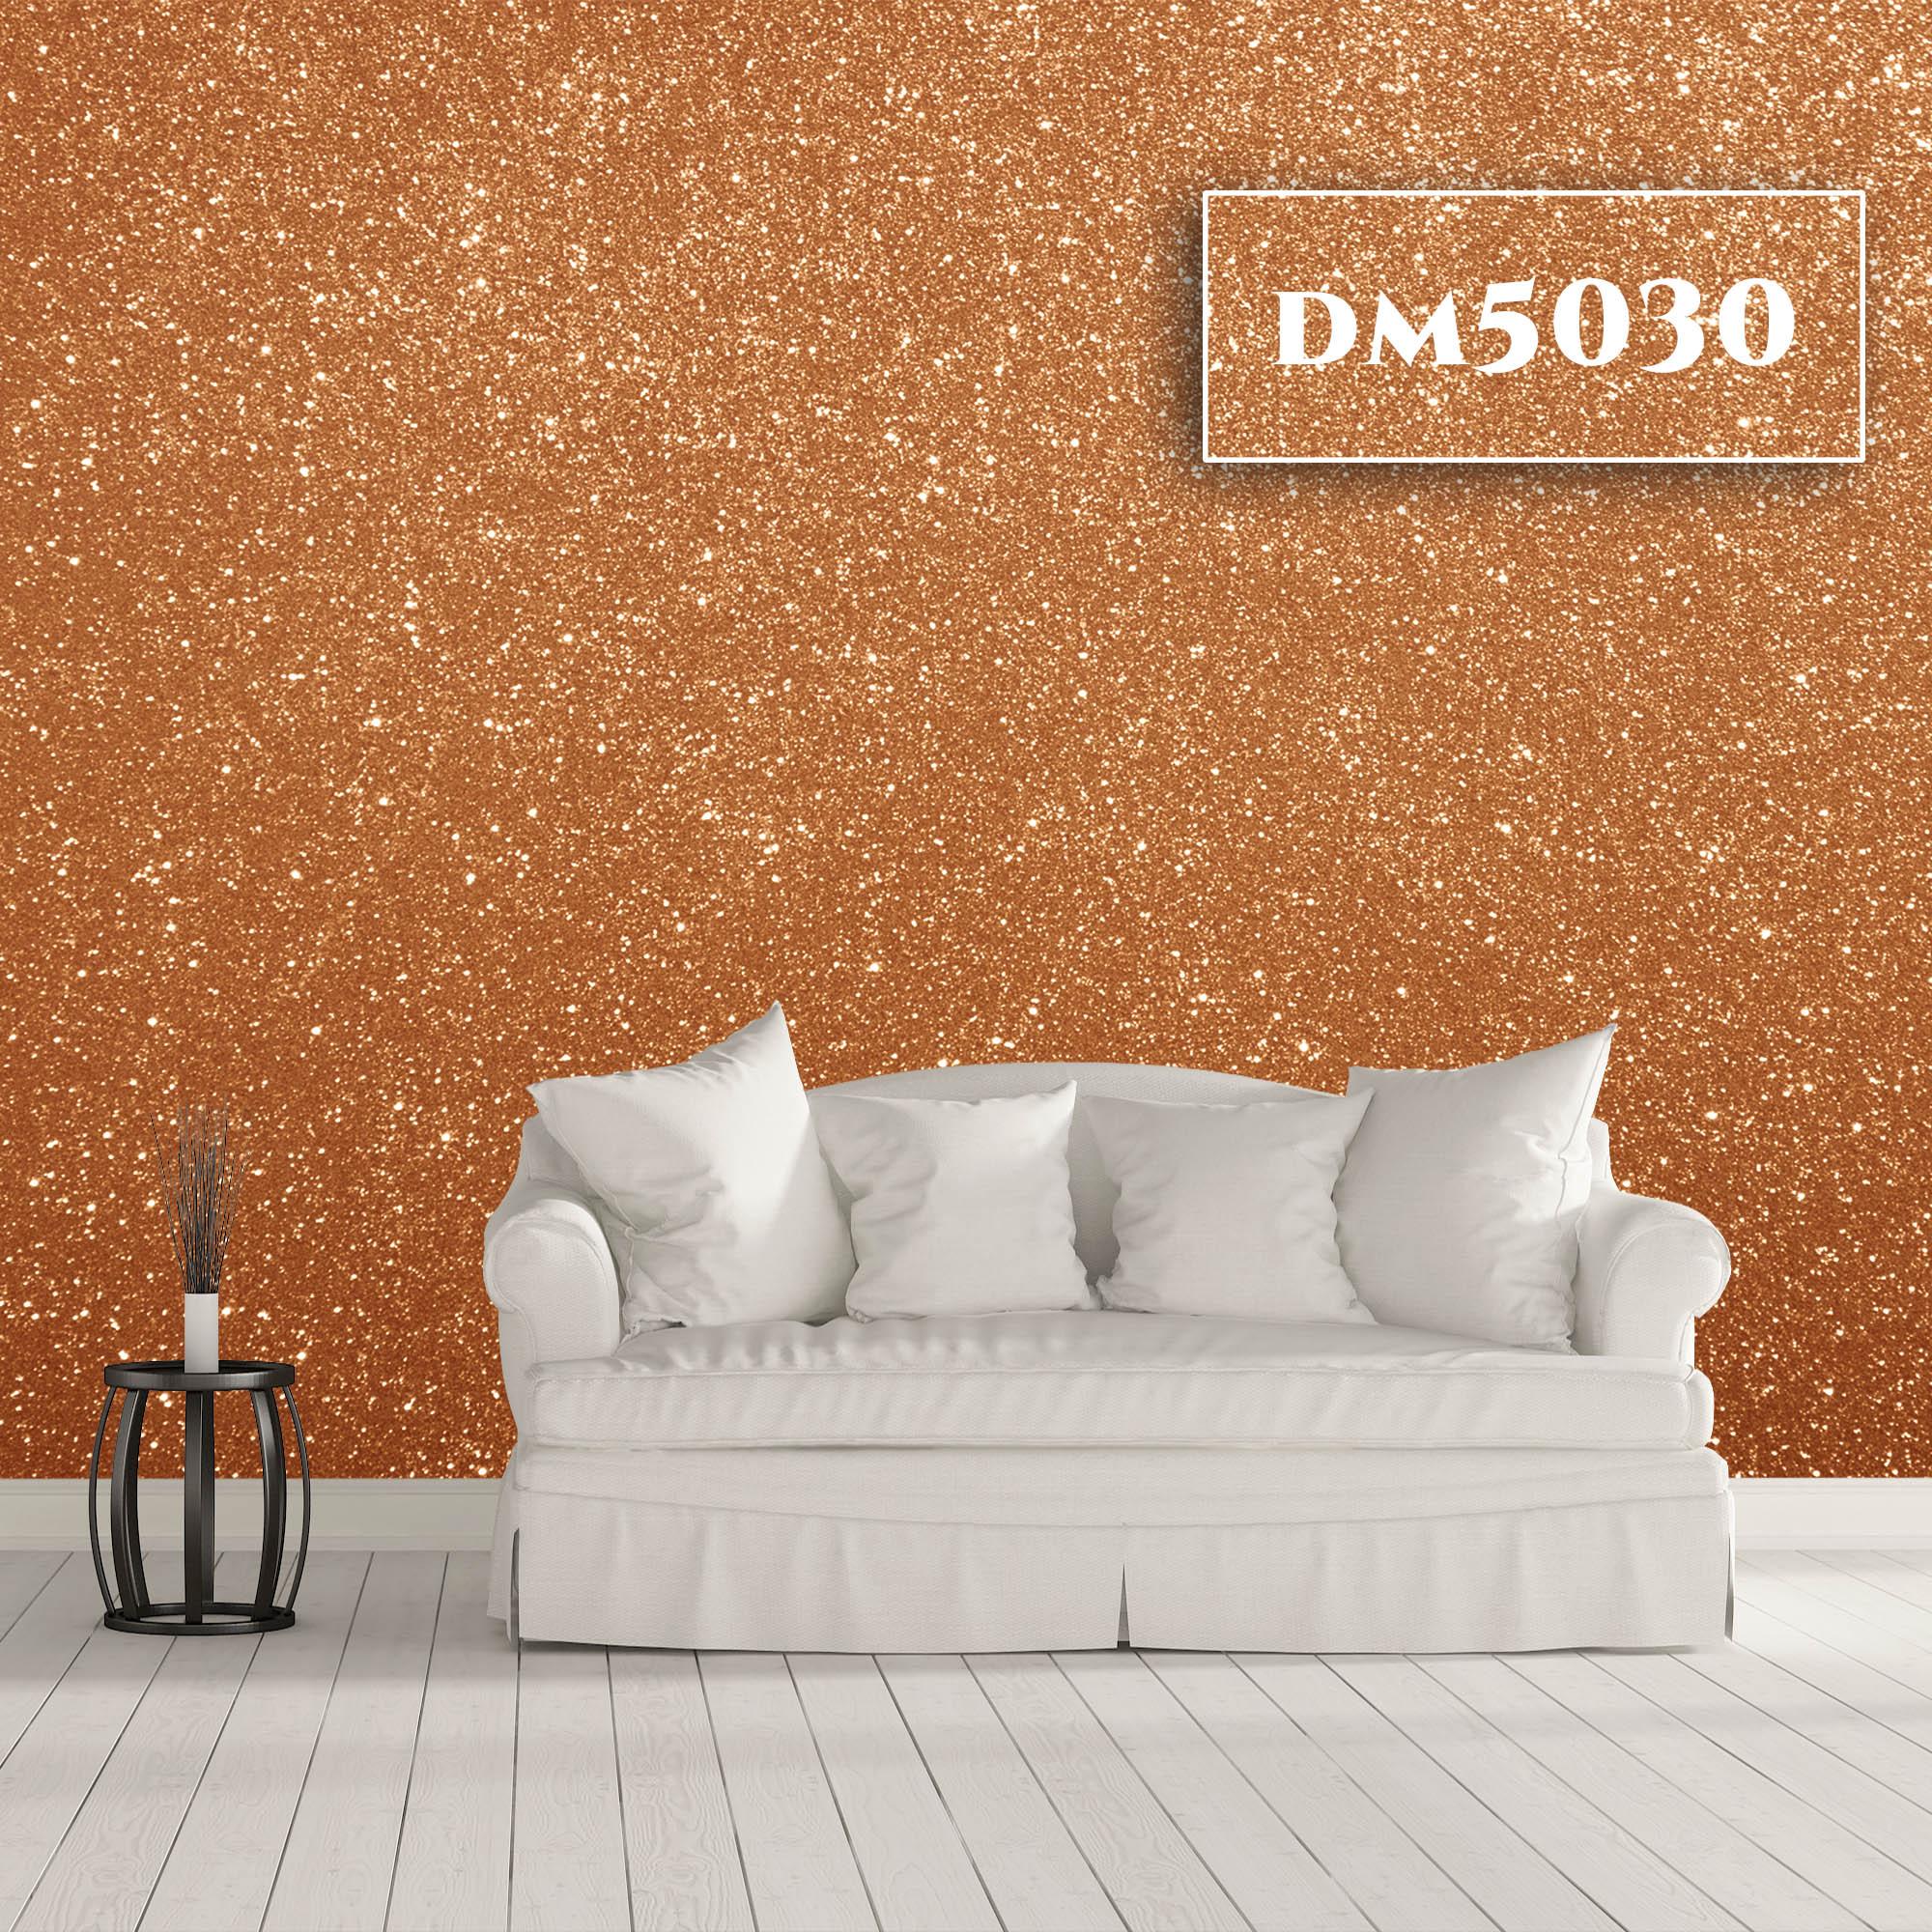 DM5030